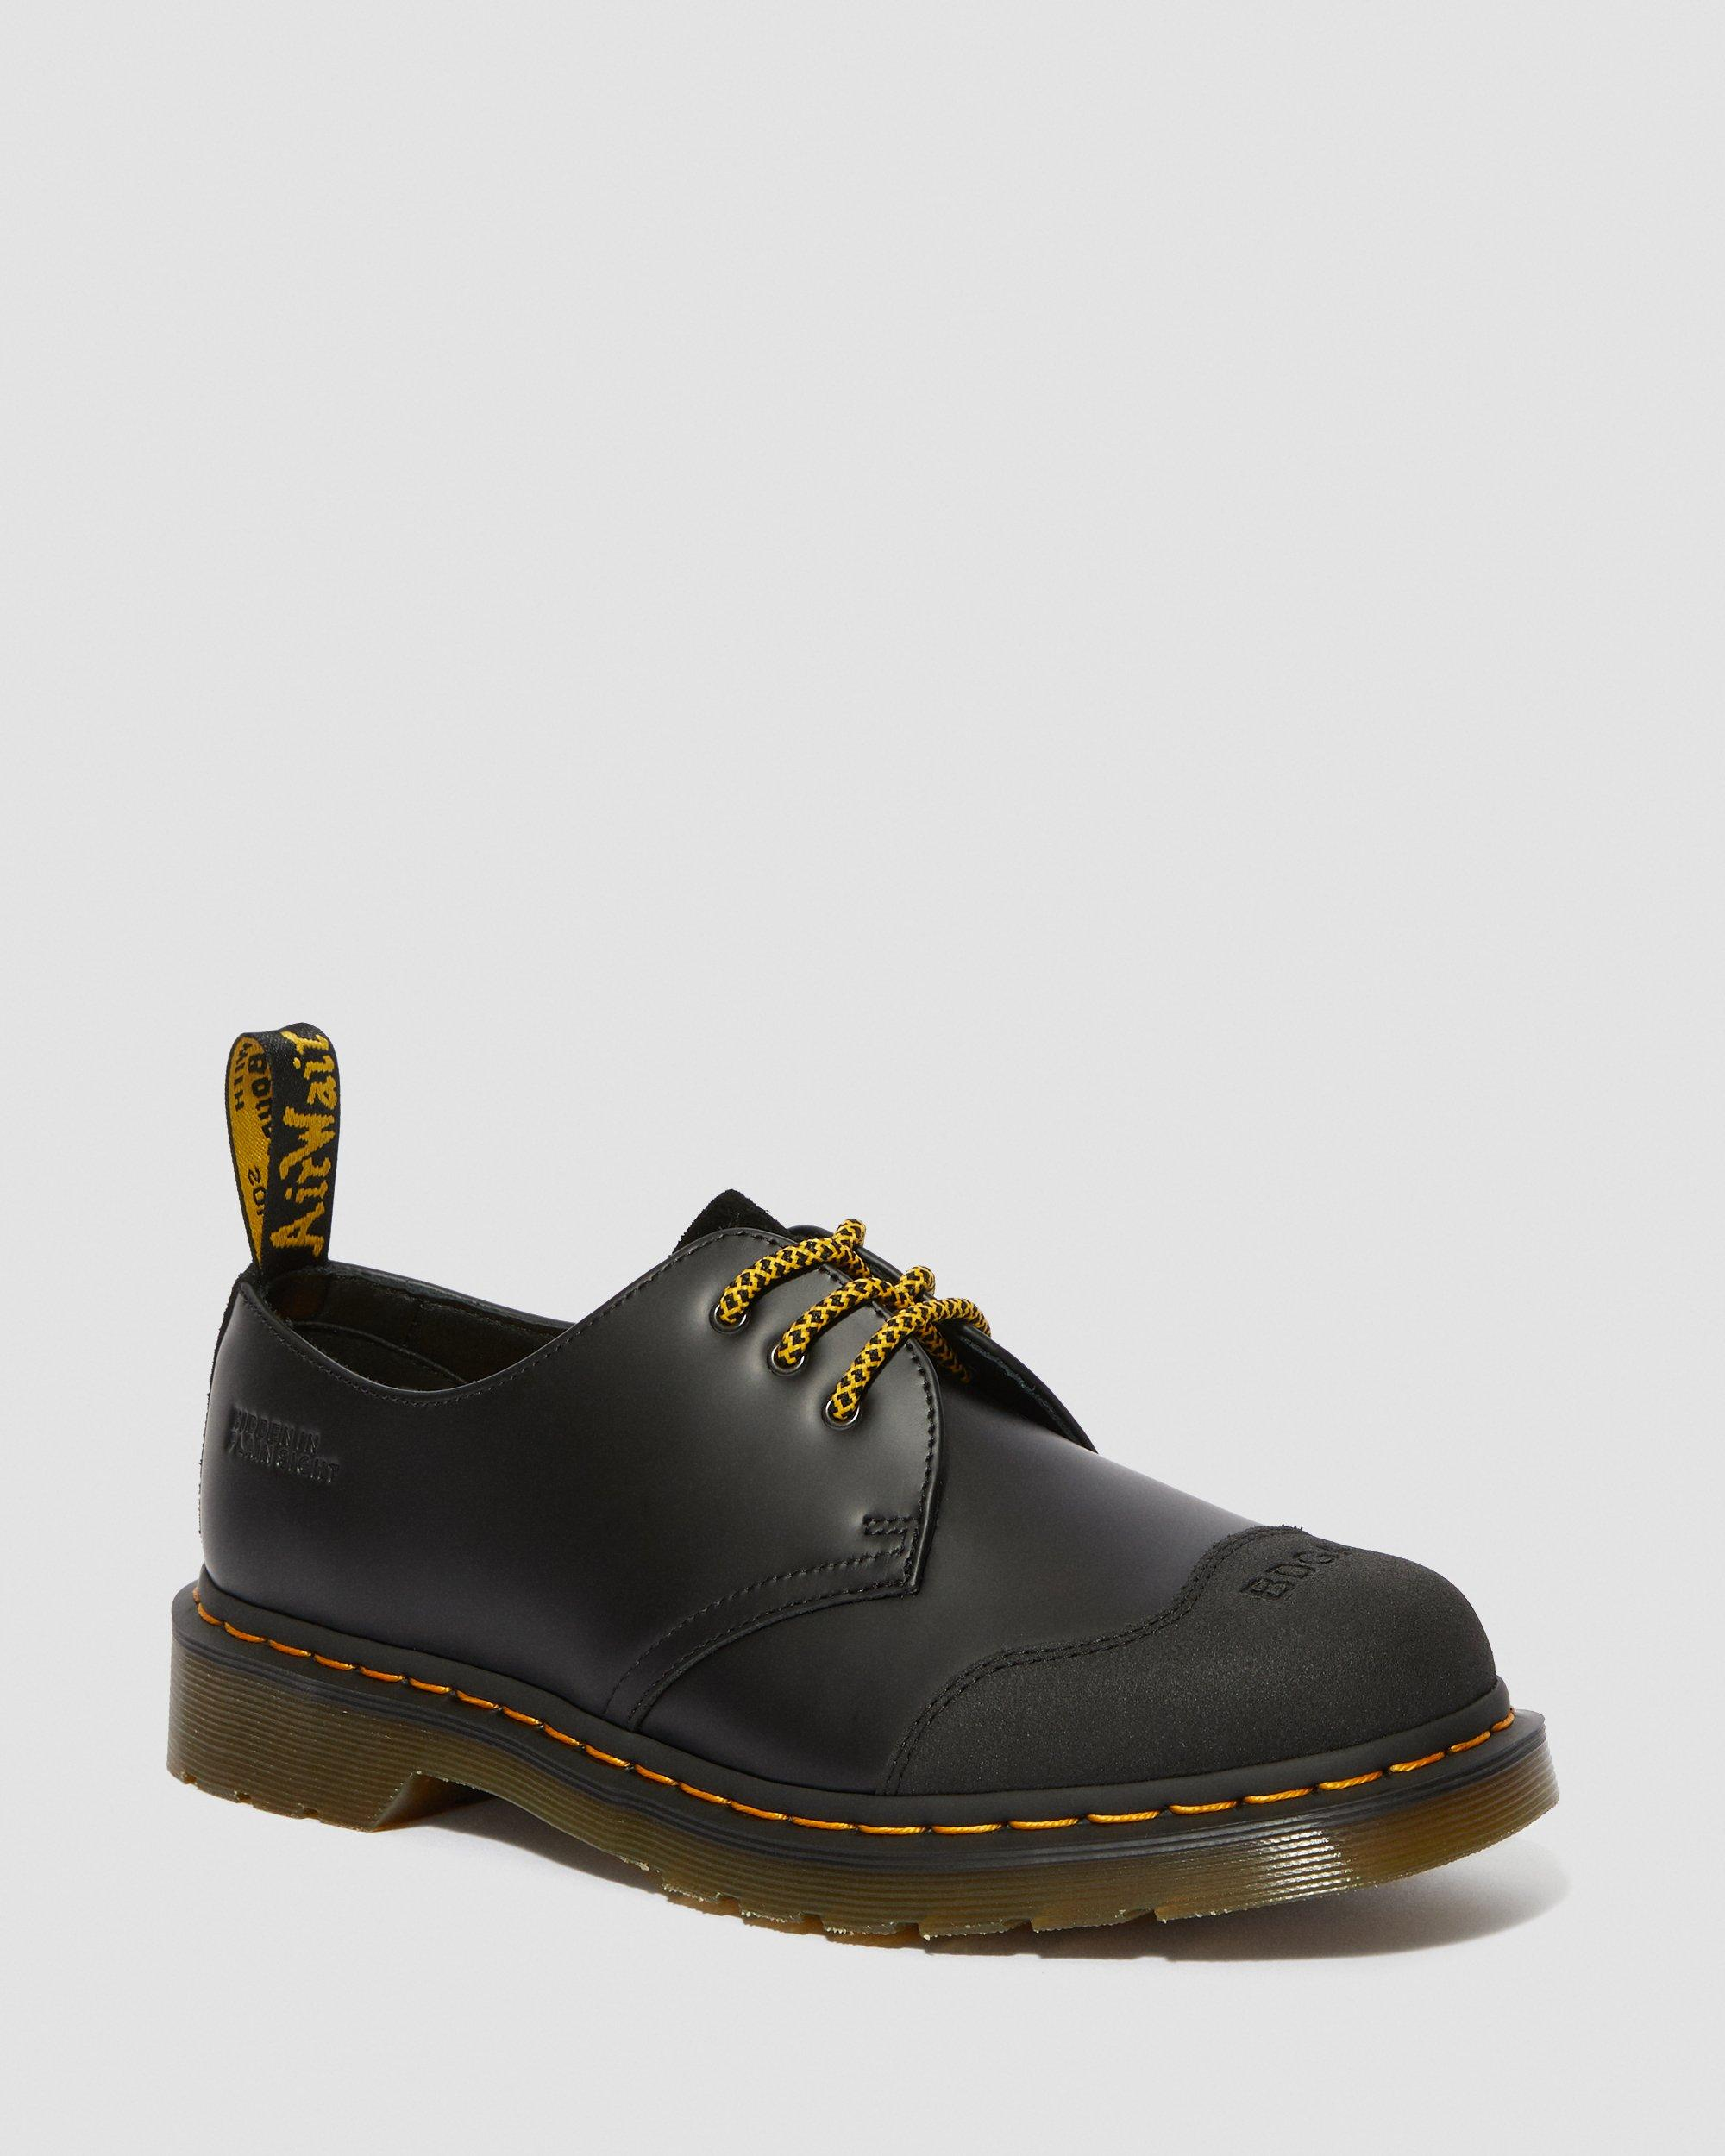 1461 BODEGA | Collabs | Leder Stiefel, Schuhe & Accessoires